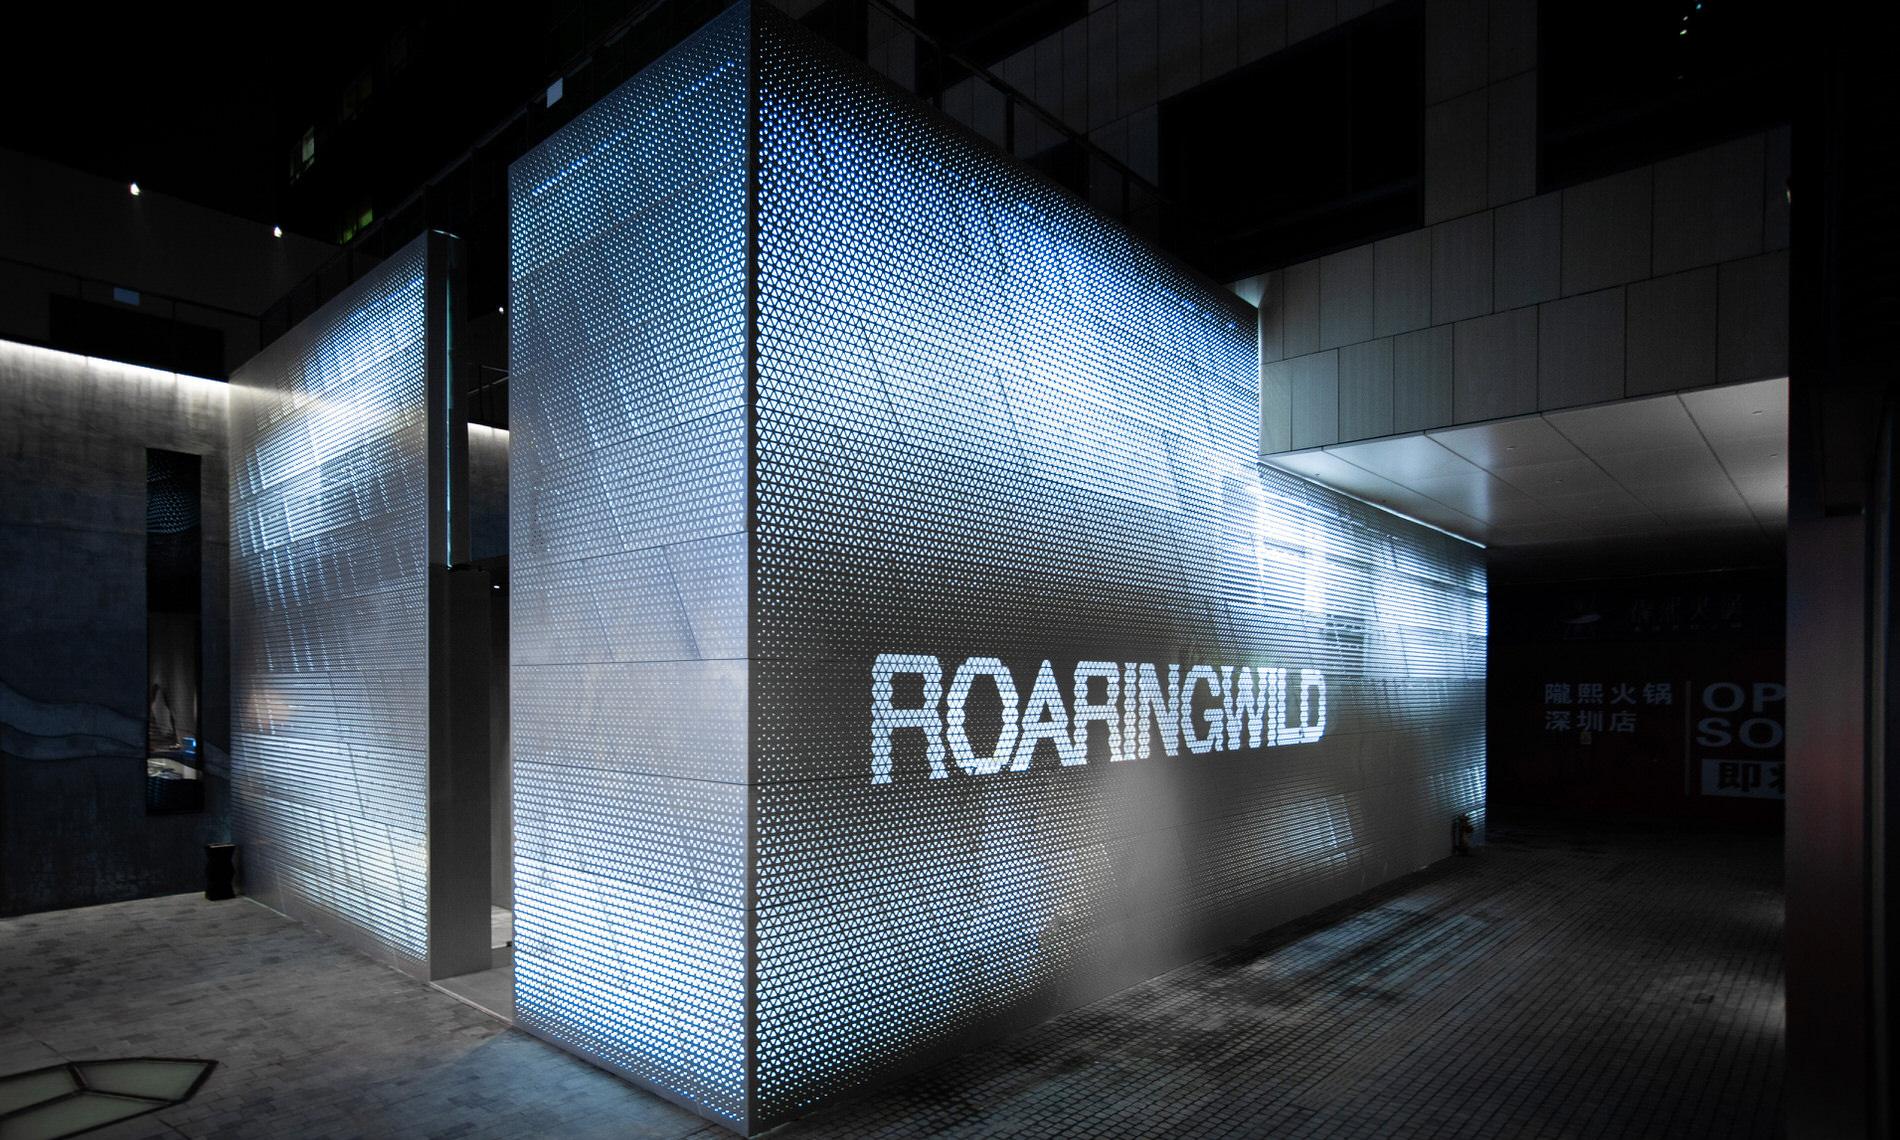 ROARINGWILD 深圳概念旗舰店正式开业